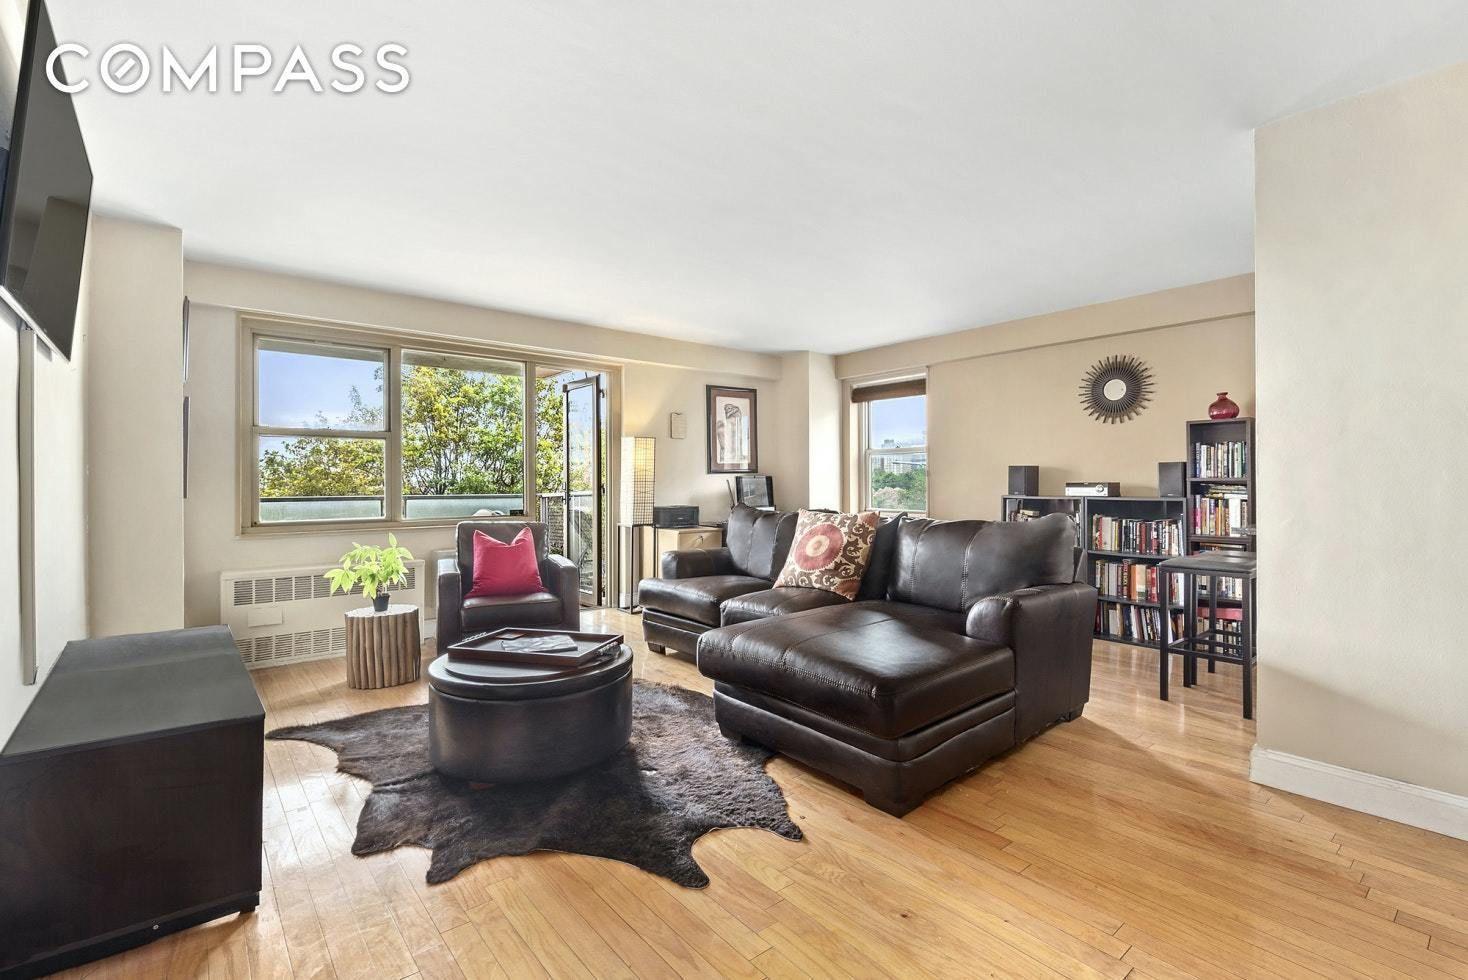 Apartment for sale at 12399 Flatlands Avenue, Apt 3-C